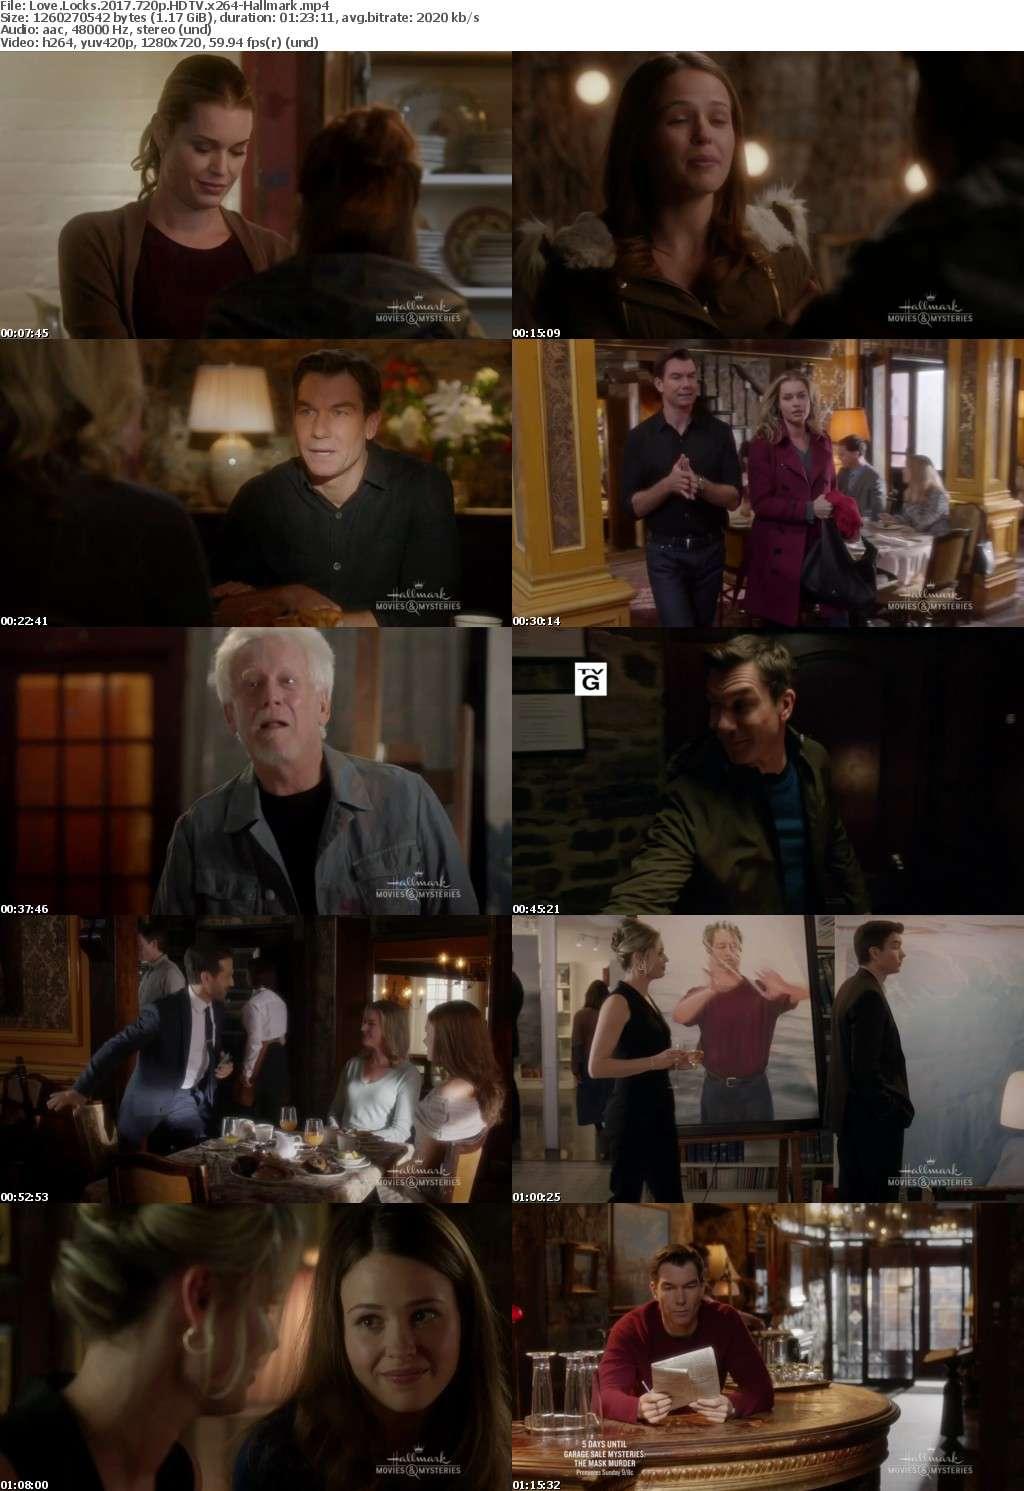 Love Locks 2017 720p HDTV x264-Hallmark